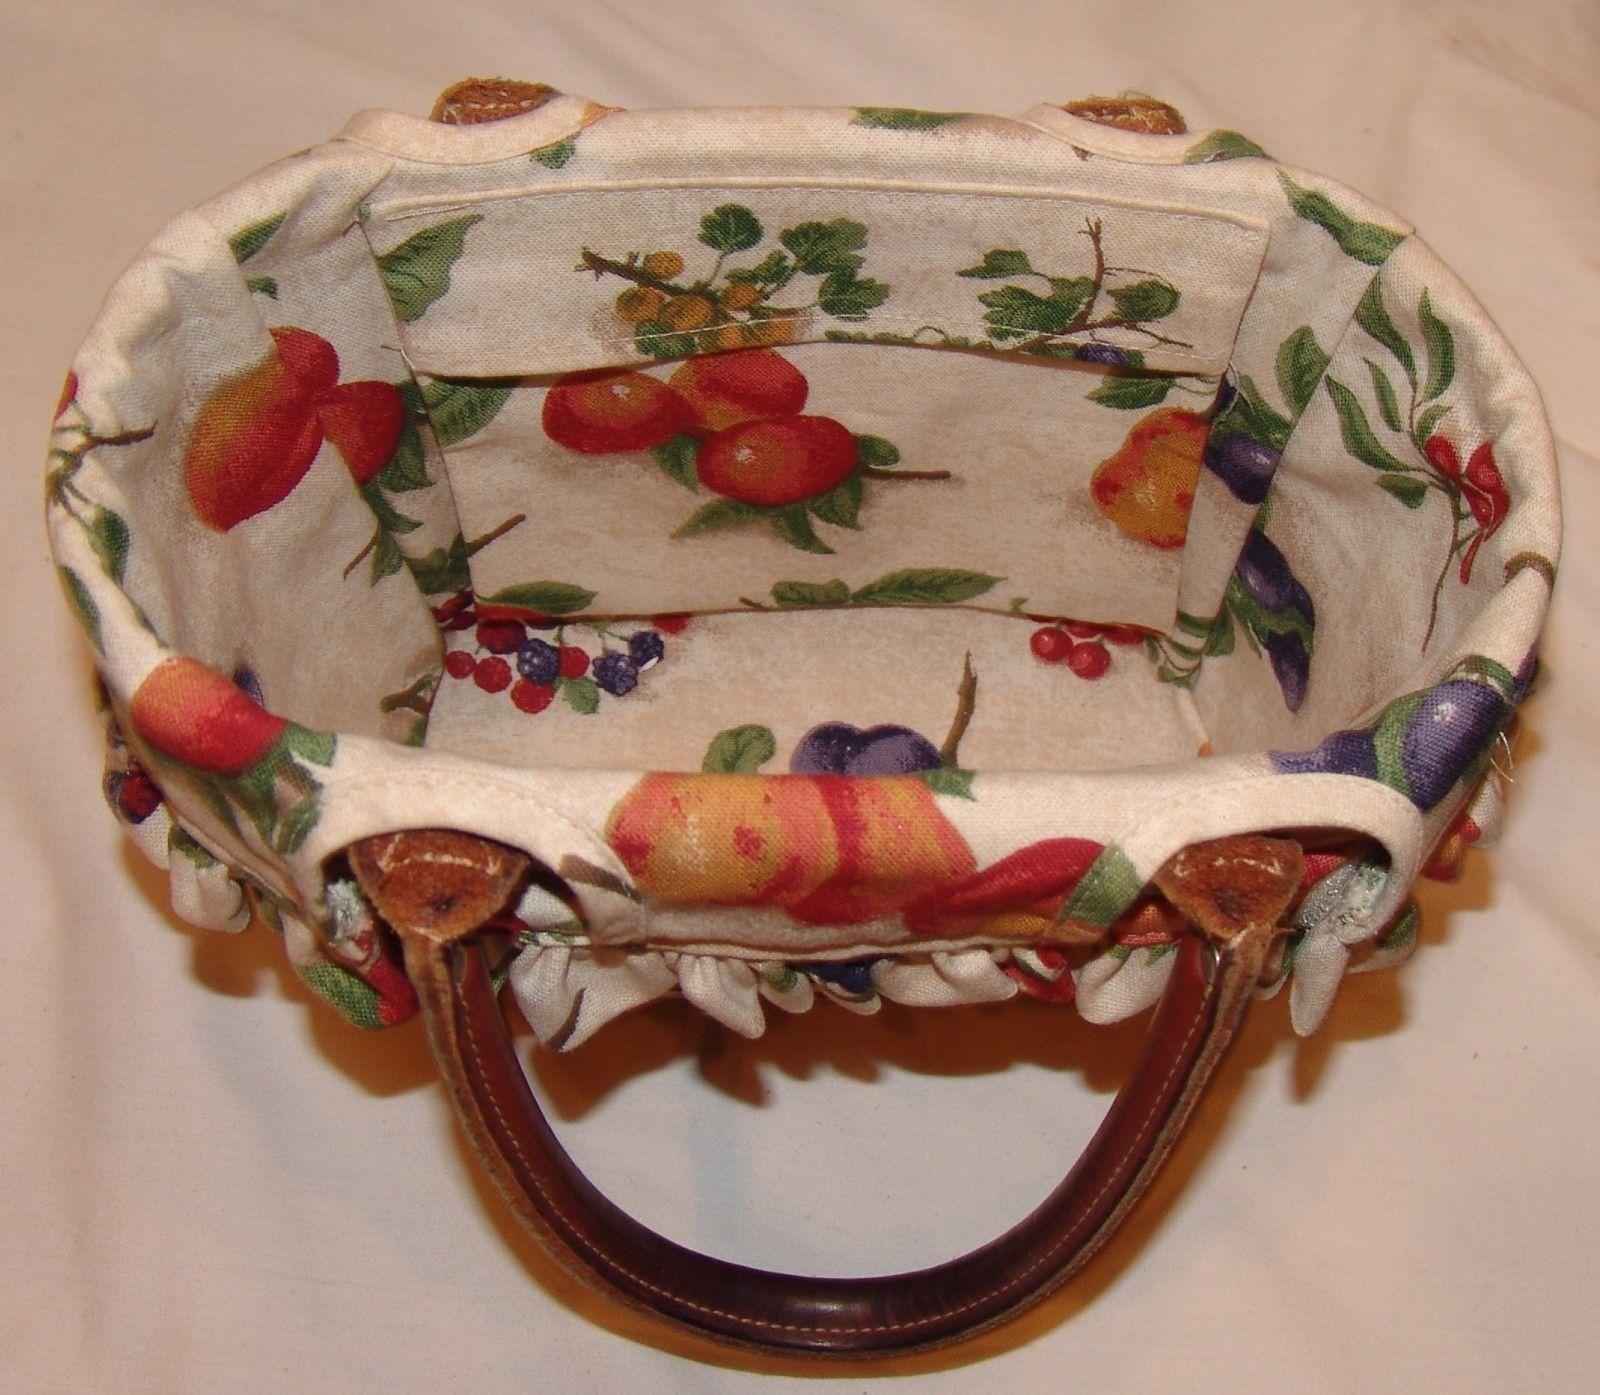 Longaberger Basket w/ Leather Handles w/ Fruit Print Lining 2004 Signed